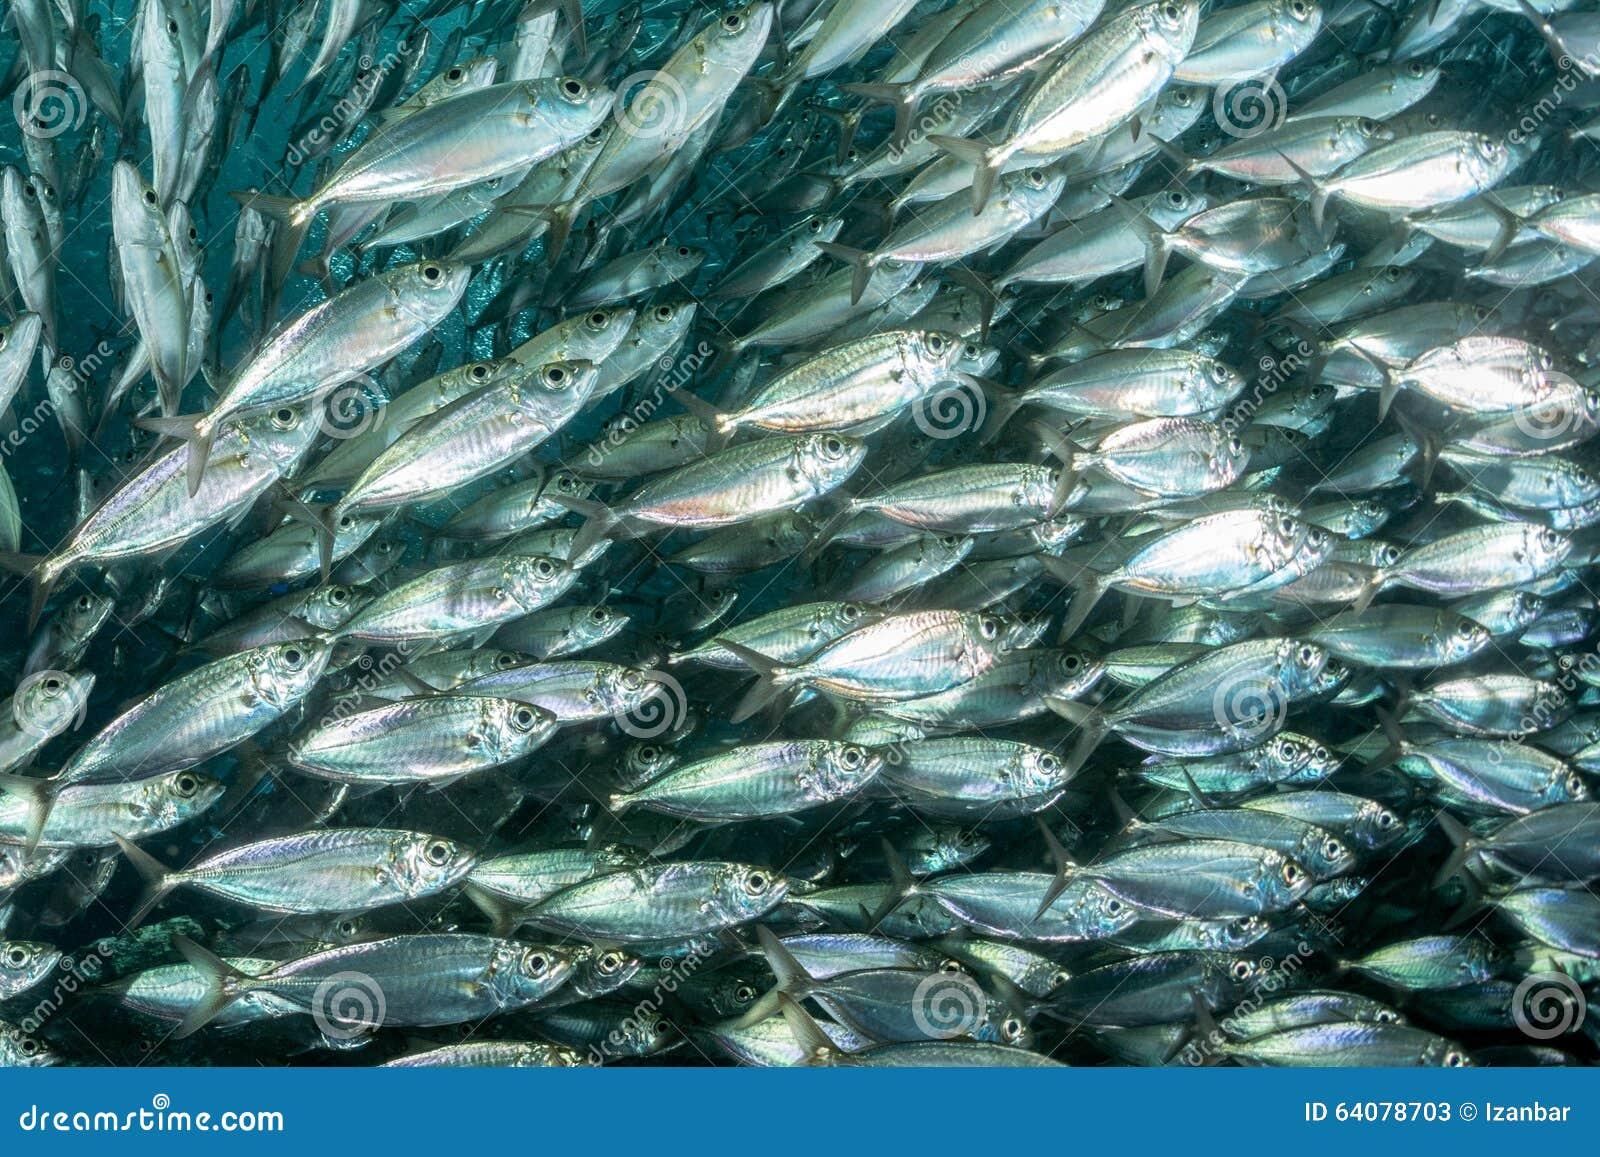 Sardine school of fish underwater stock photo image for School of fish lure